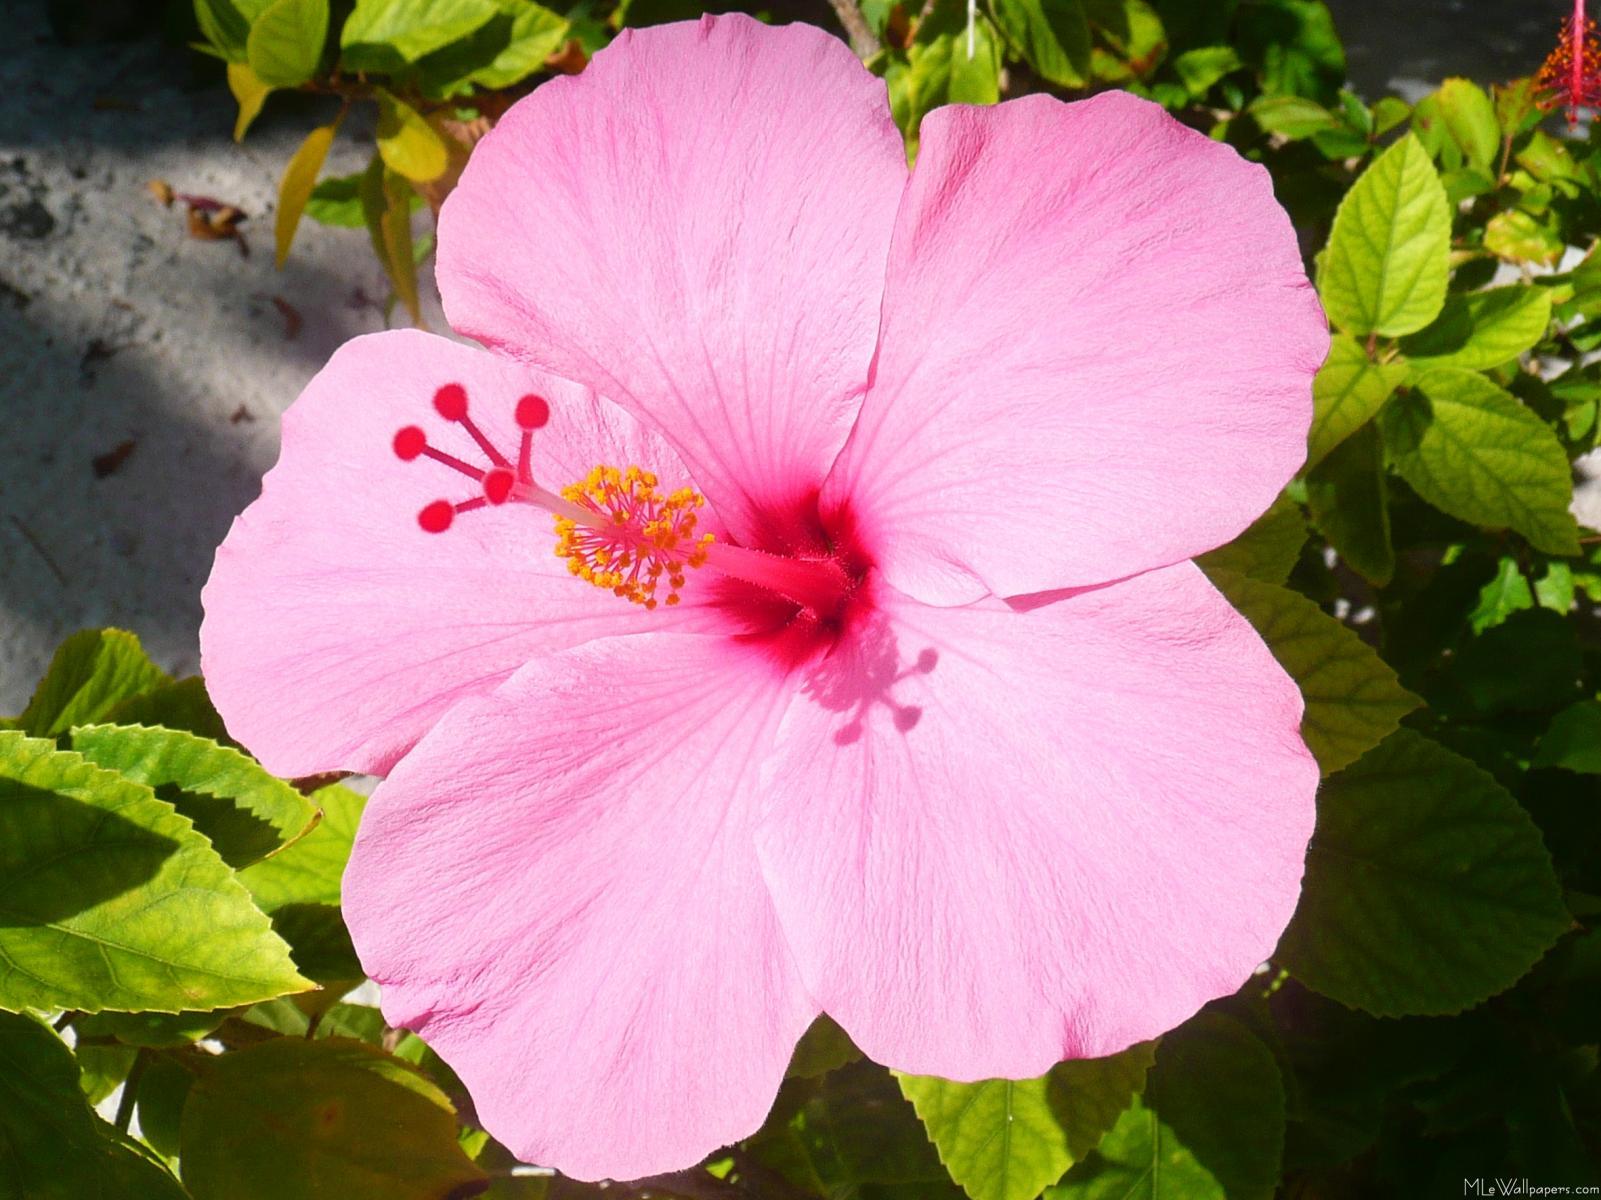 http://koreancenter.org.ua/wp-content/uploads/2011/05/Pink-Hibiscus.jpg